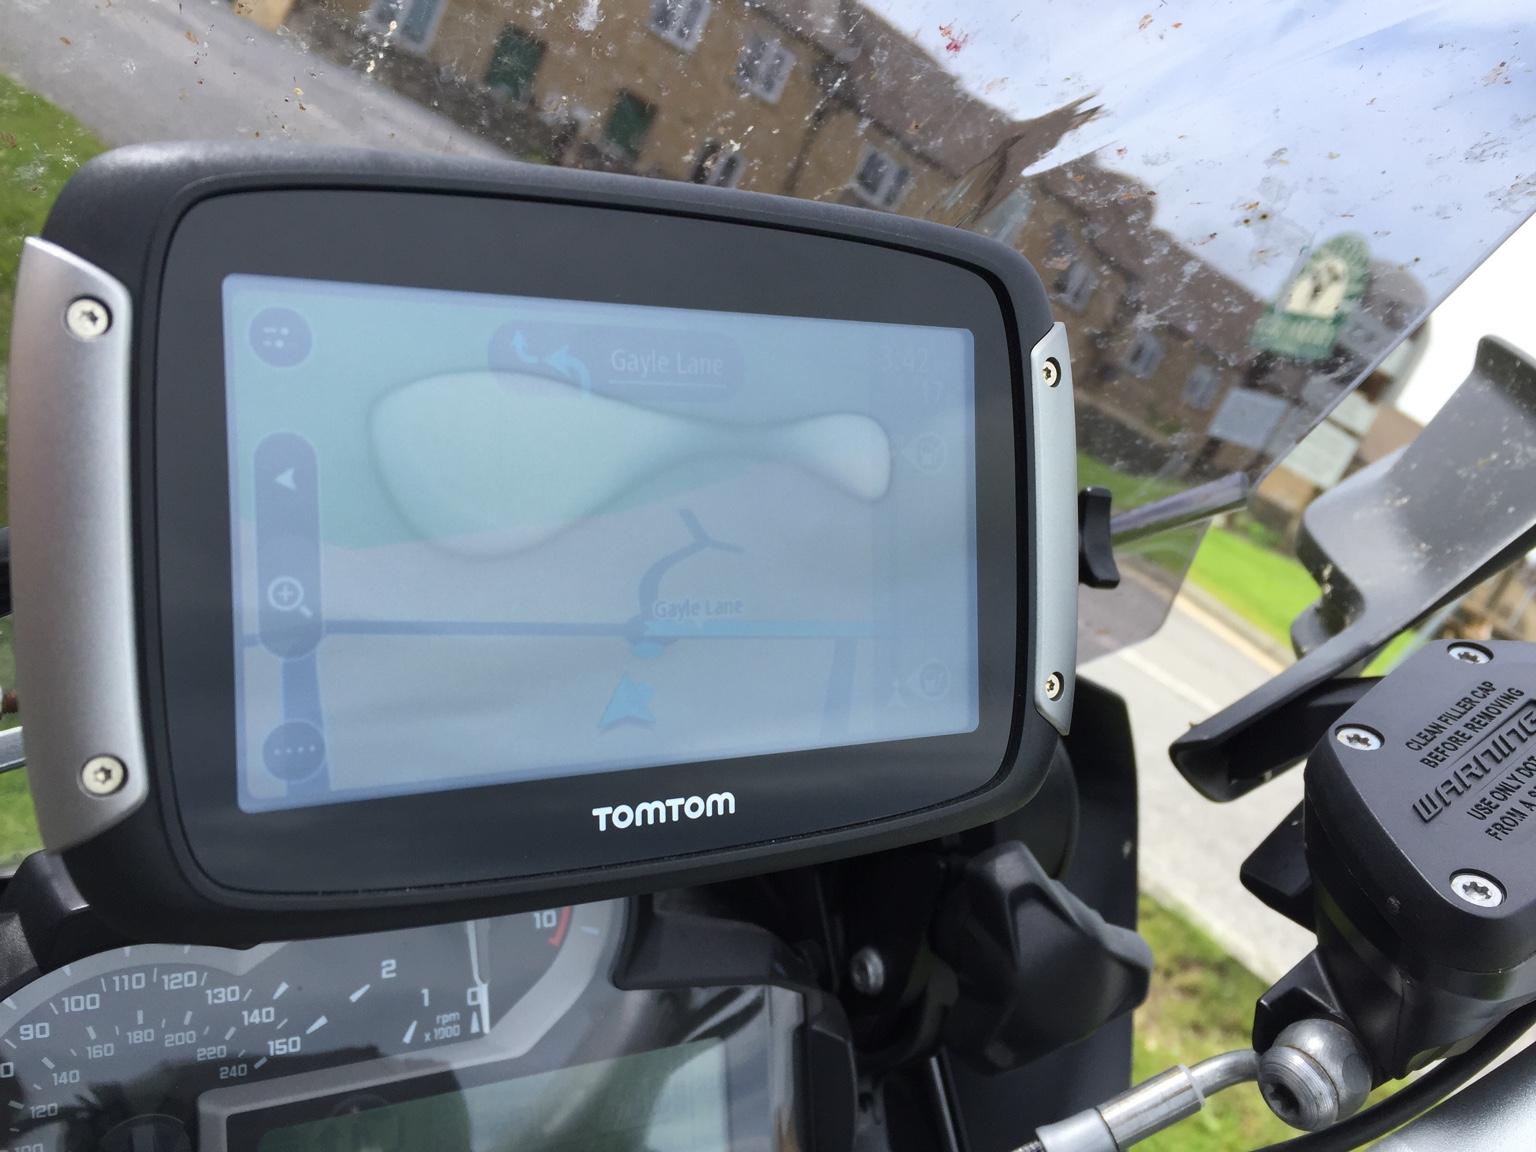 Tomtom Rider 400 screen condensation